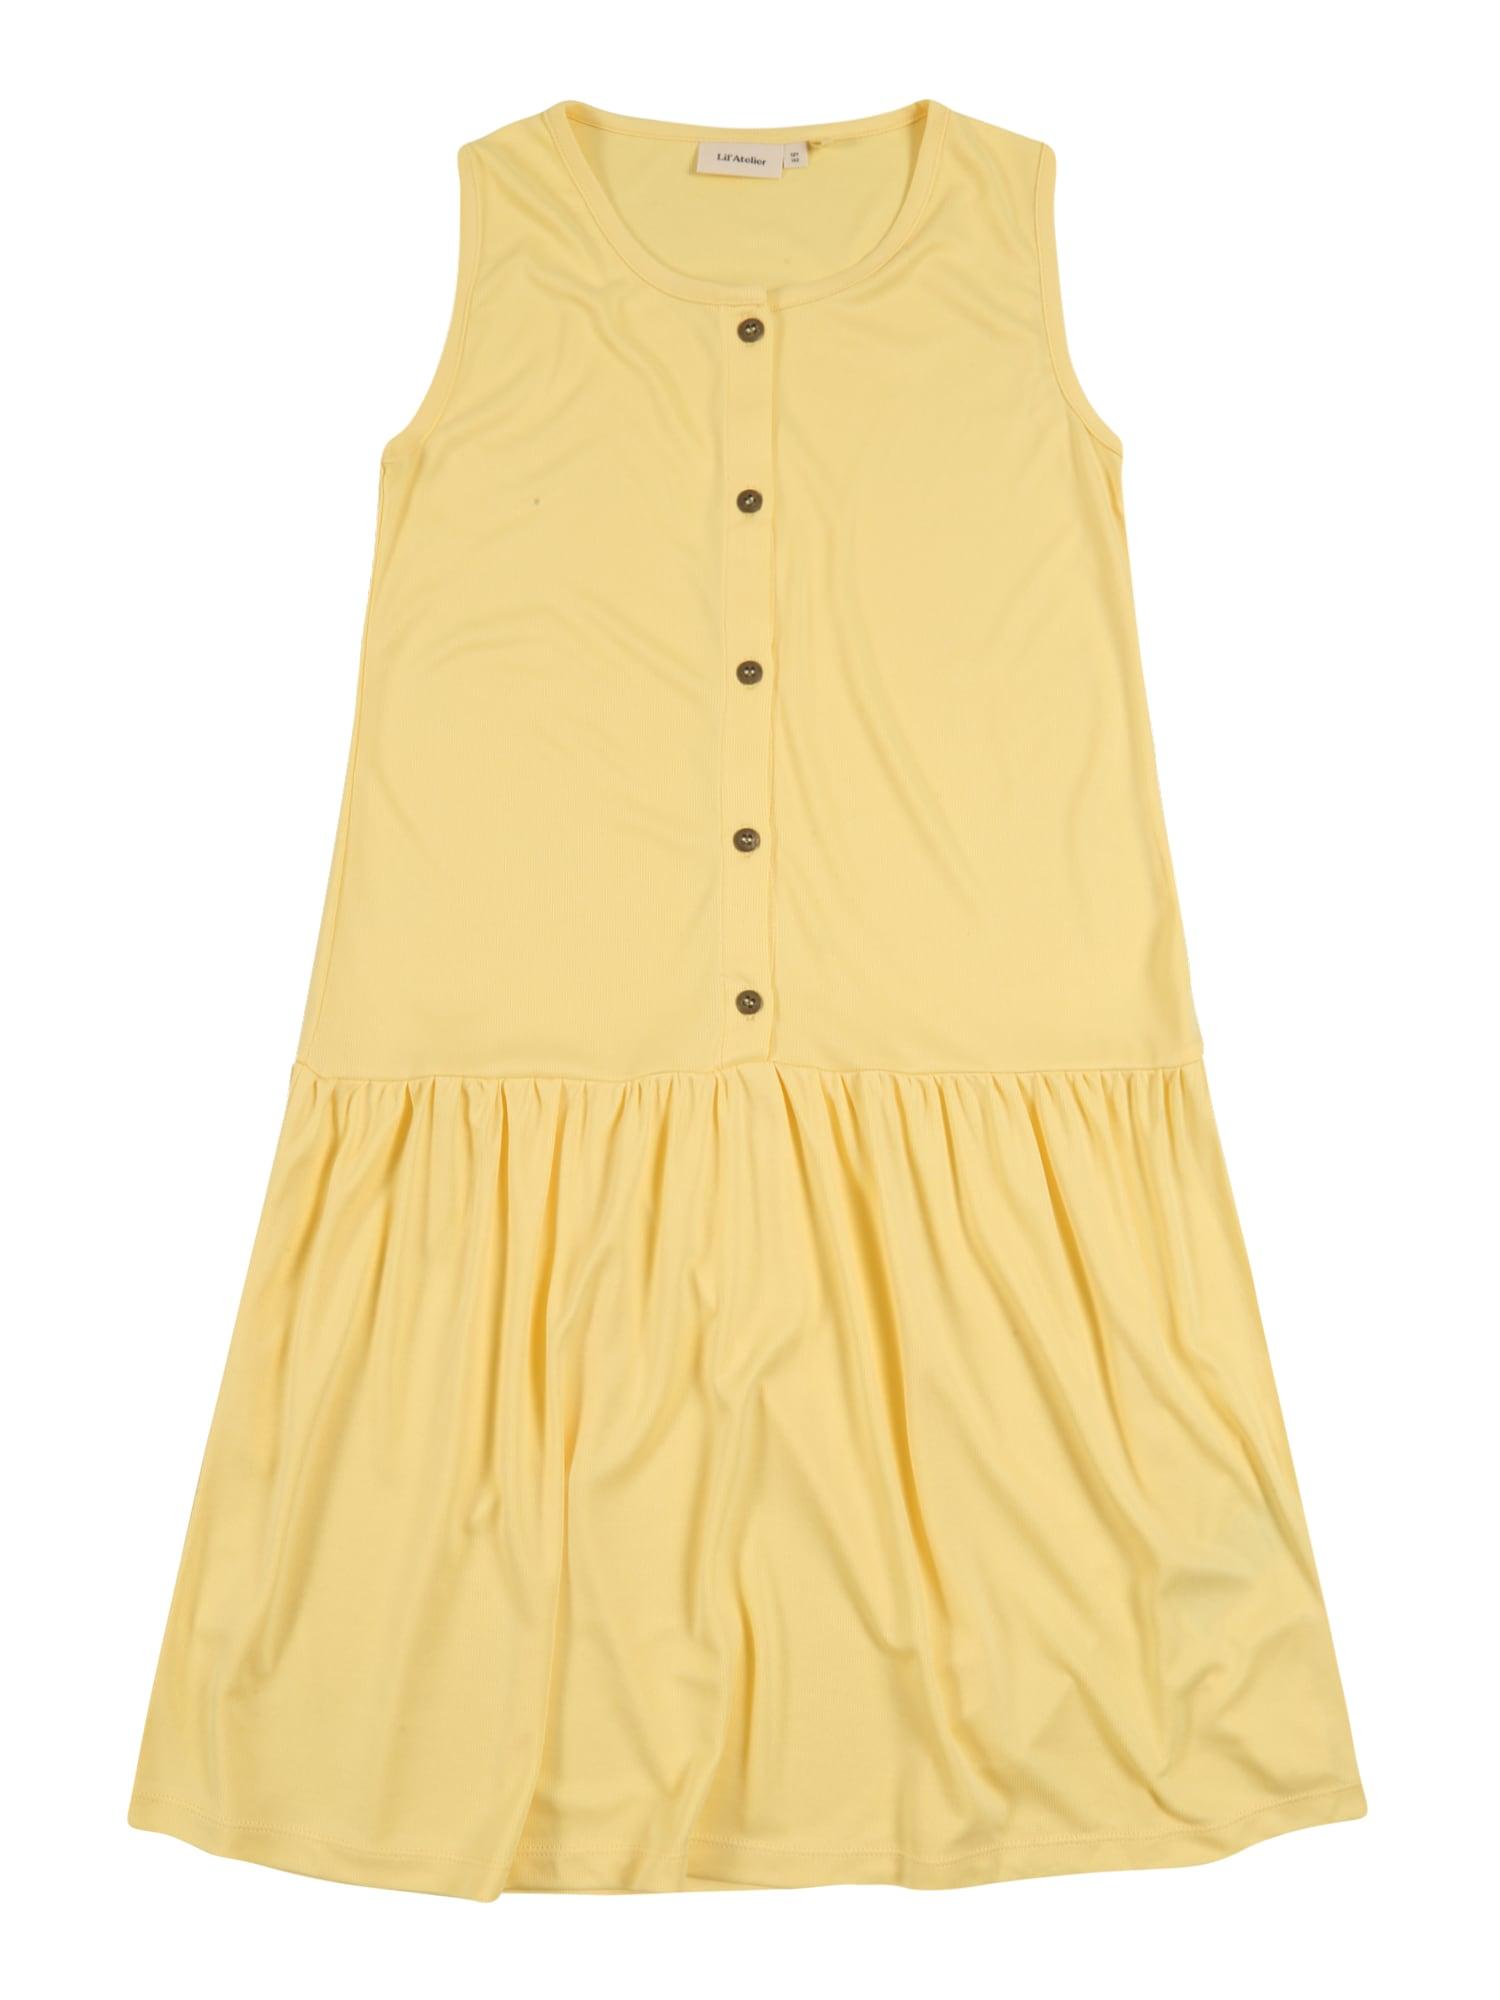 Lil ' Atelier Kids Suknelė 'GOME' geltona